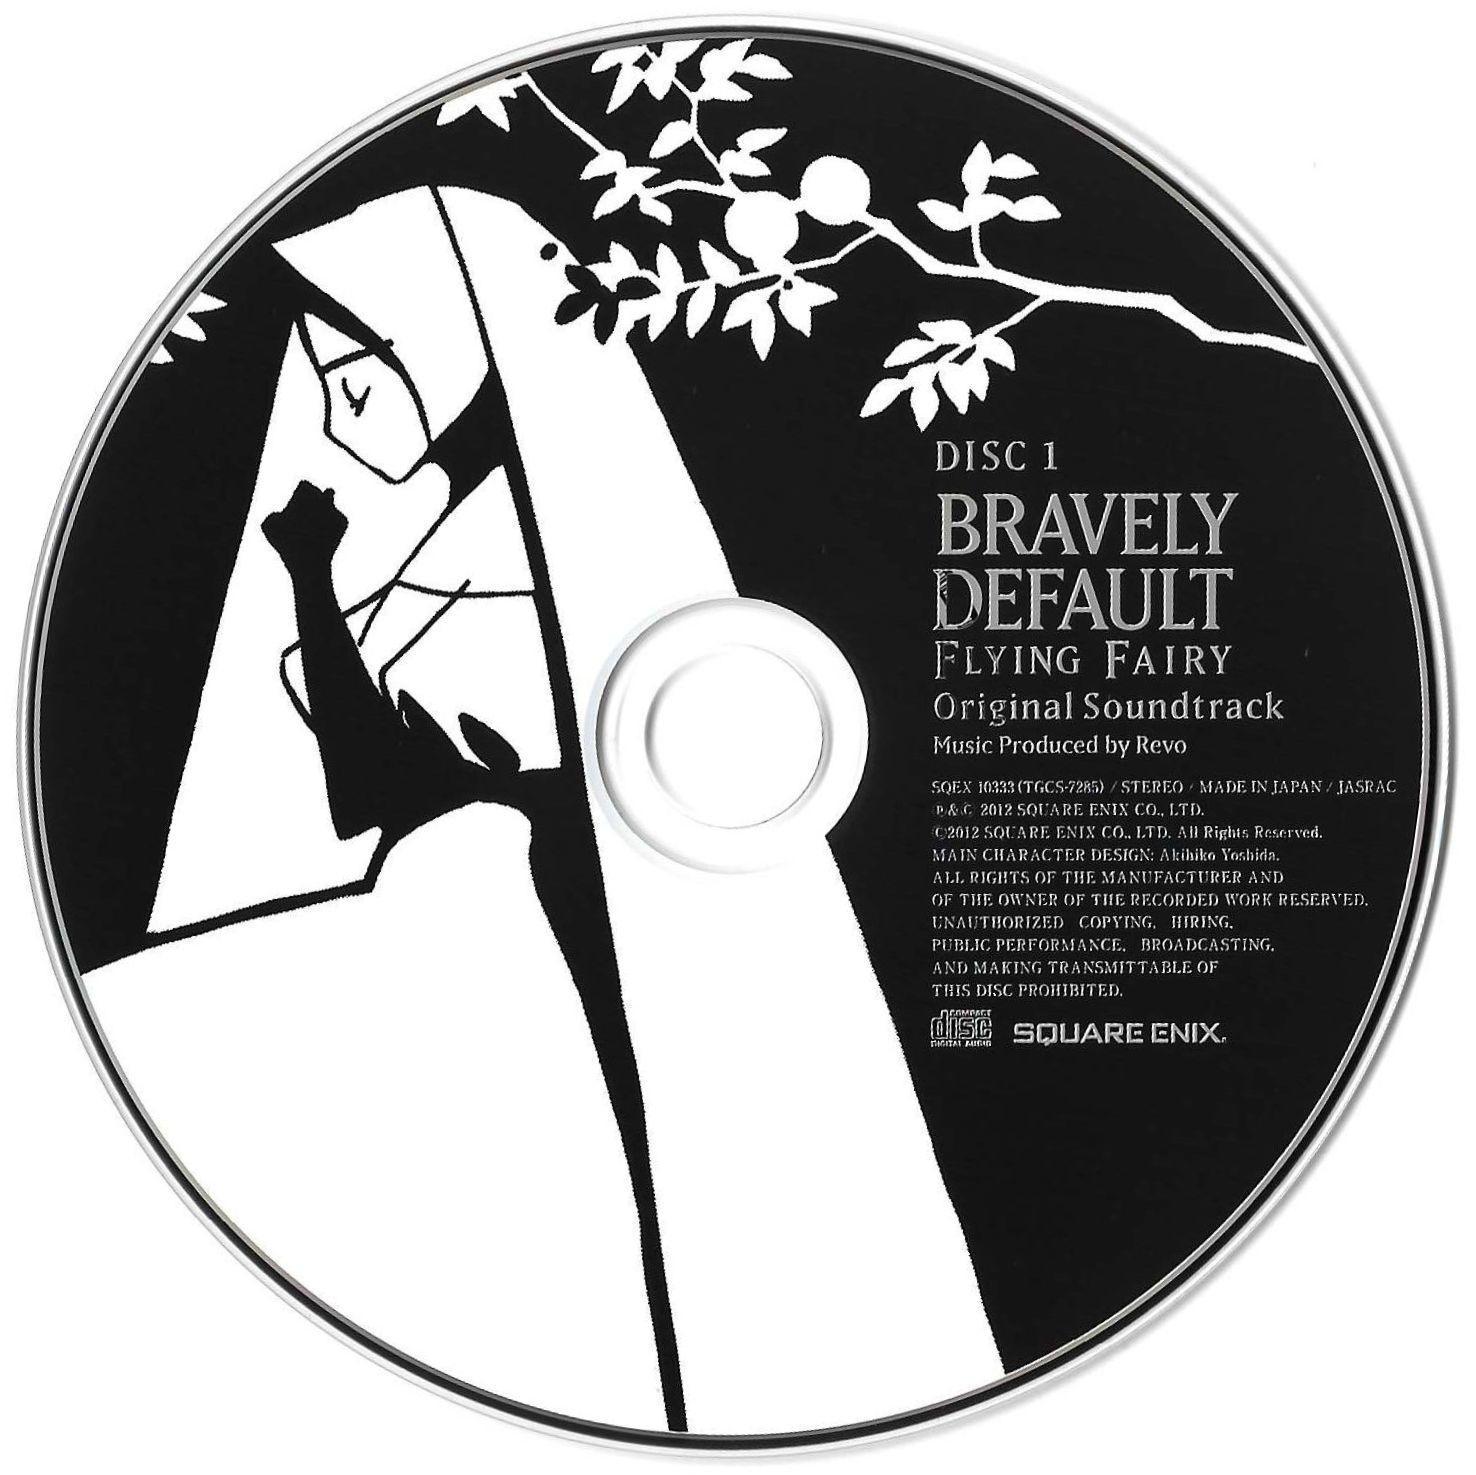 Bravely Default Flying Fairy Album: Disc 1, Artbook, Artwork, Sleeve